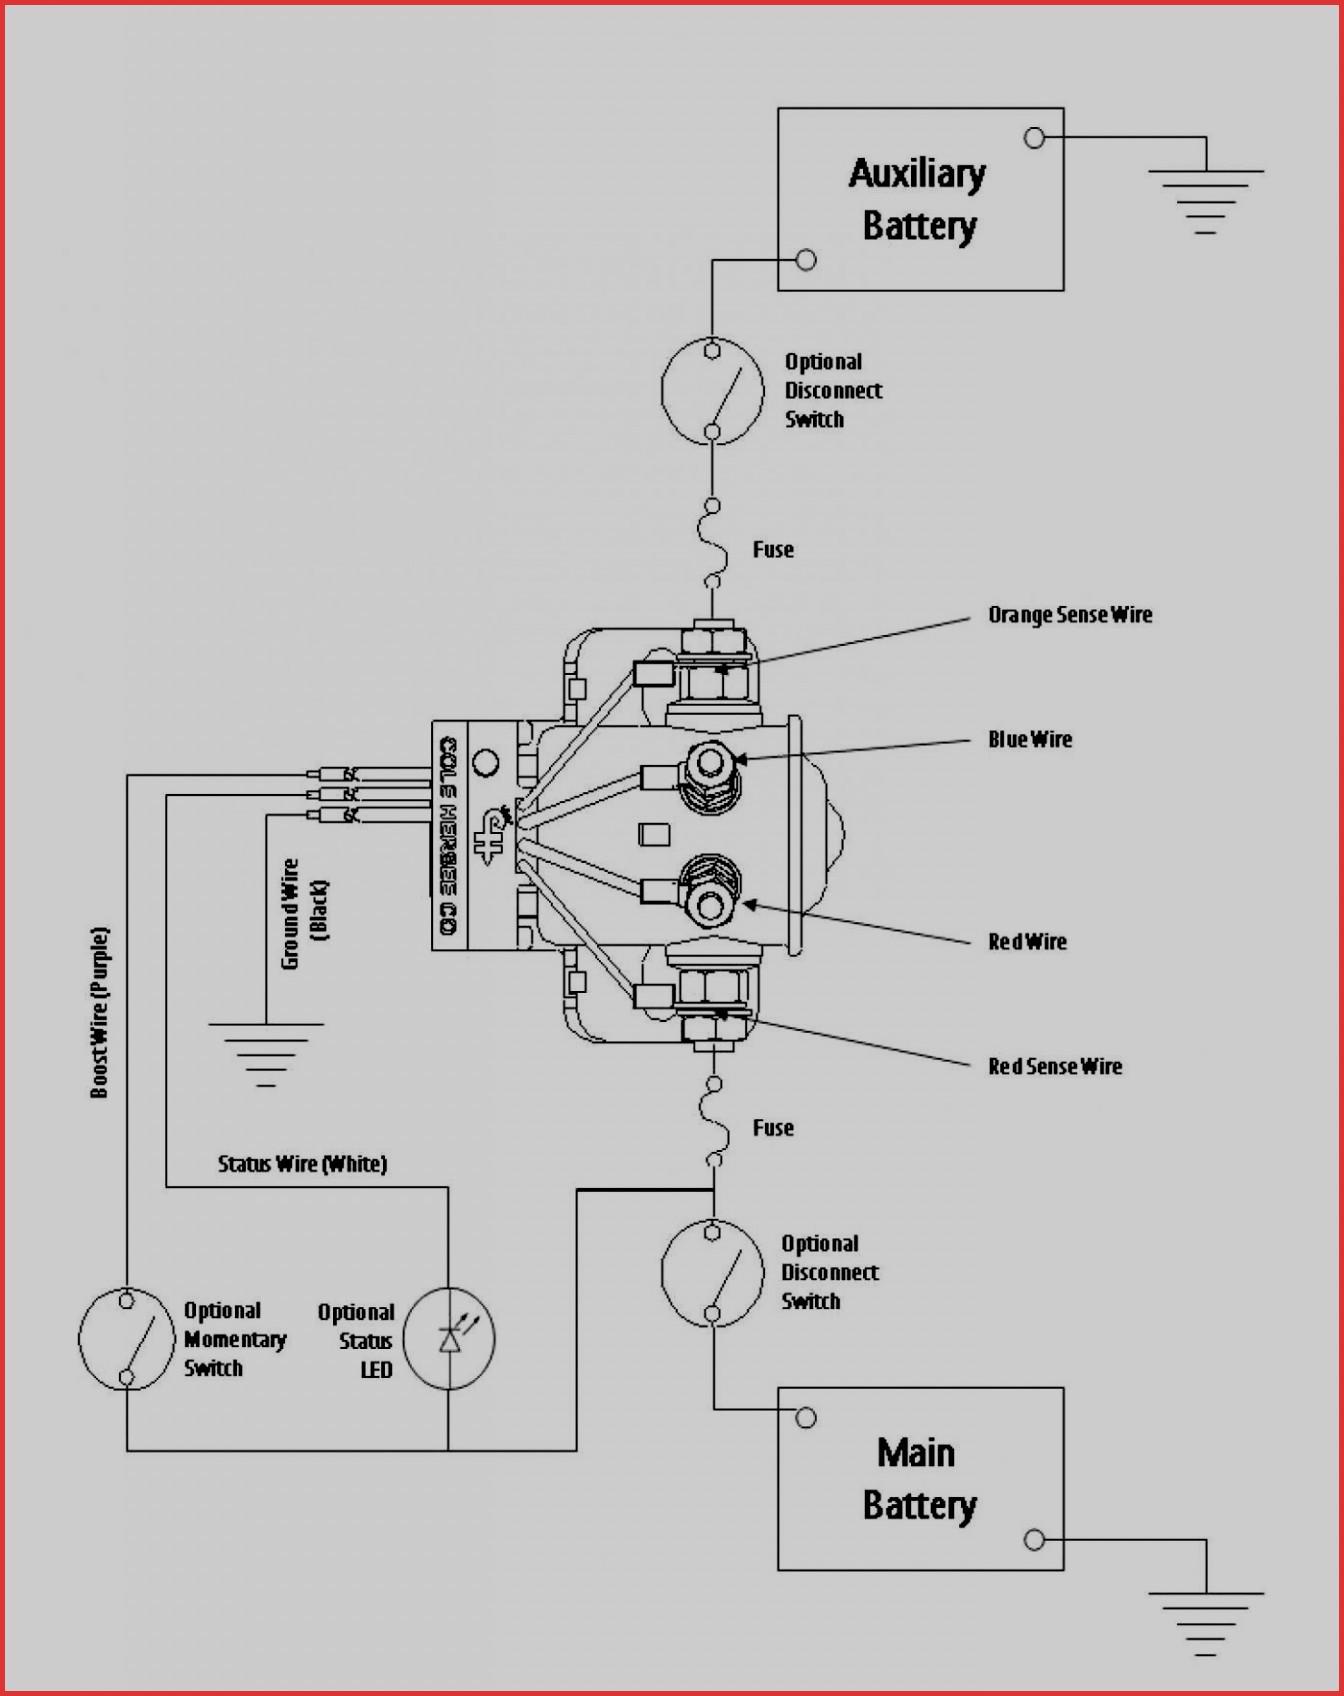 gx_2850] jayco wiring harness diagram wiring diagram  coun penghe ilari gresi chro carn ospor garna grebs unho rele  mohammedshrine librar wiring 101